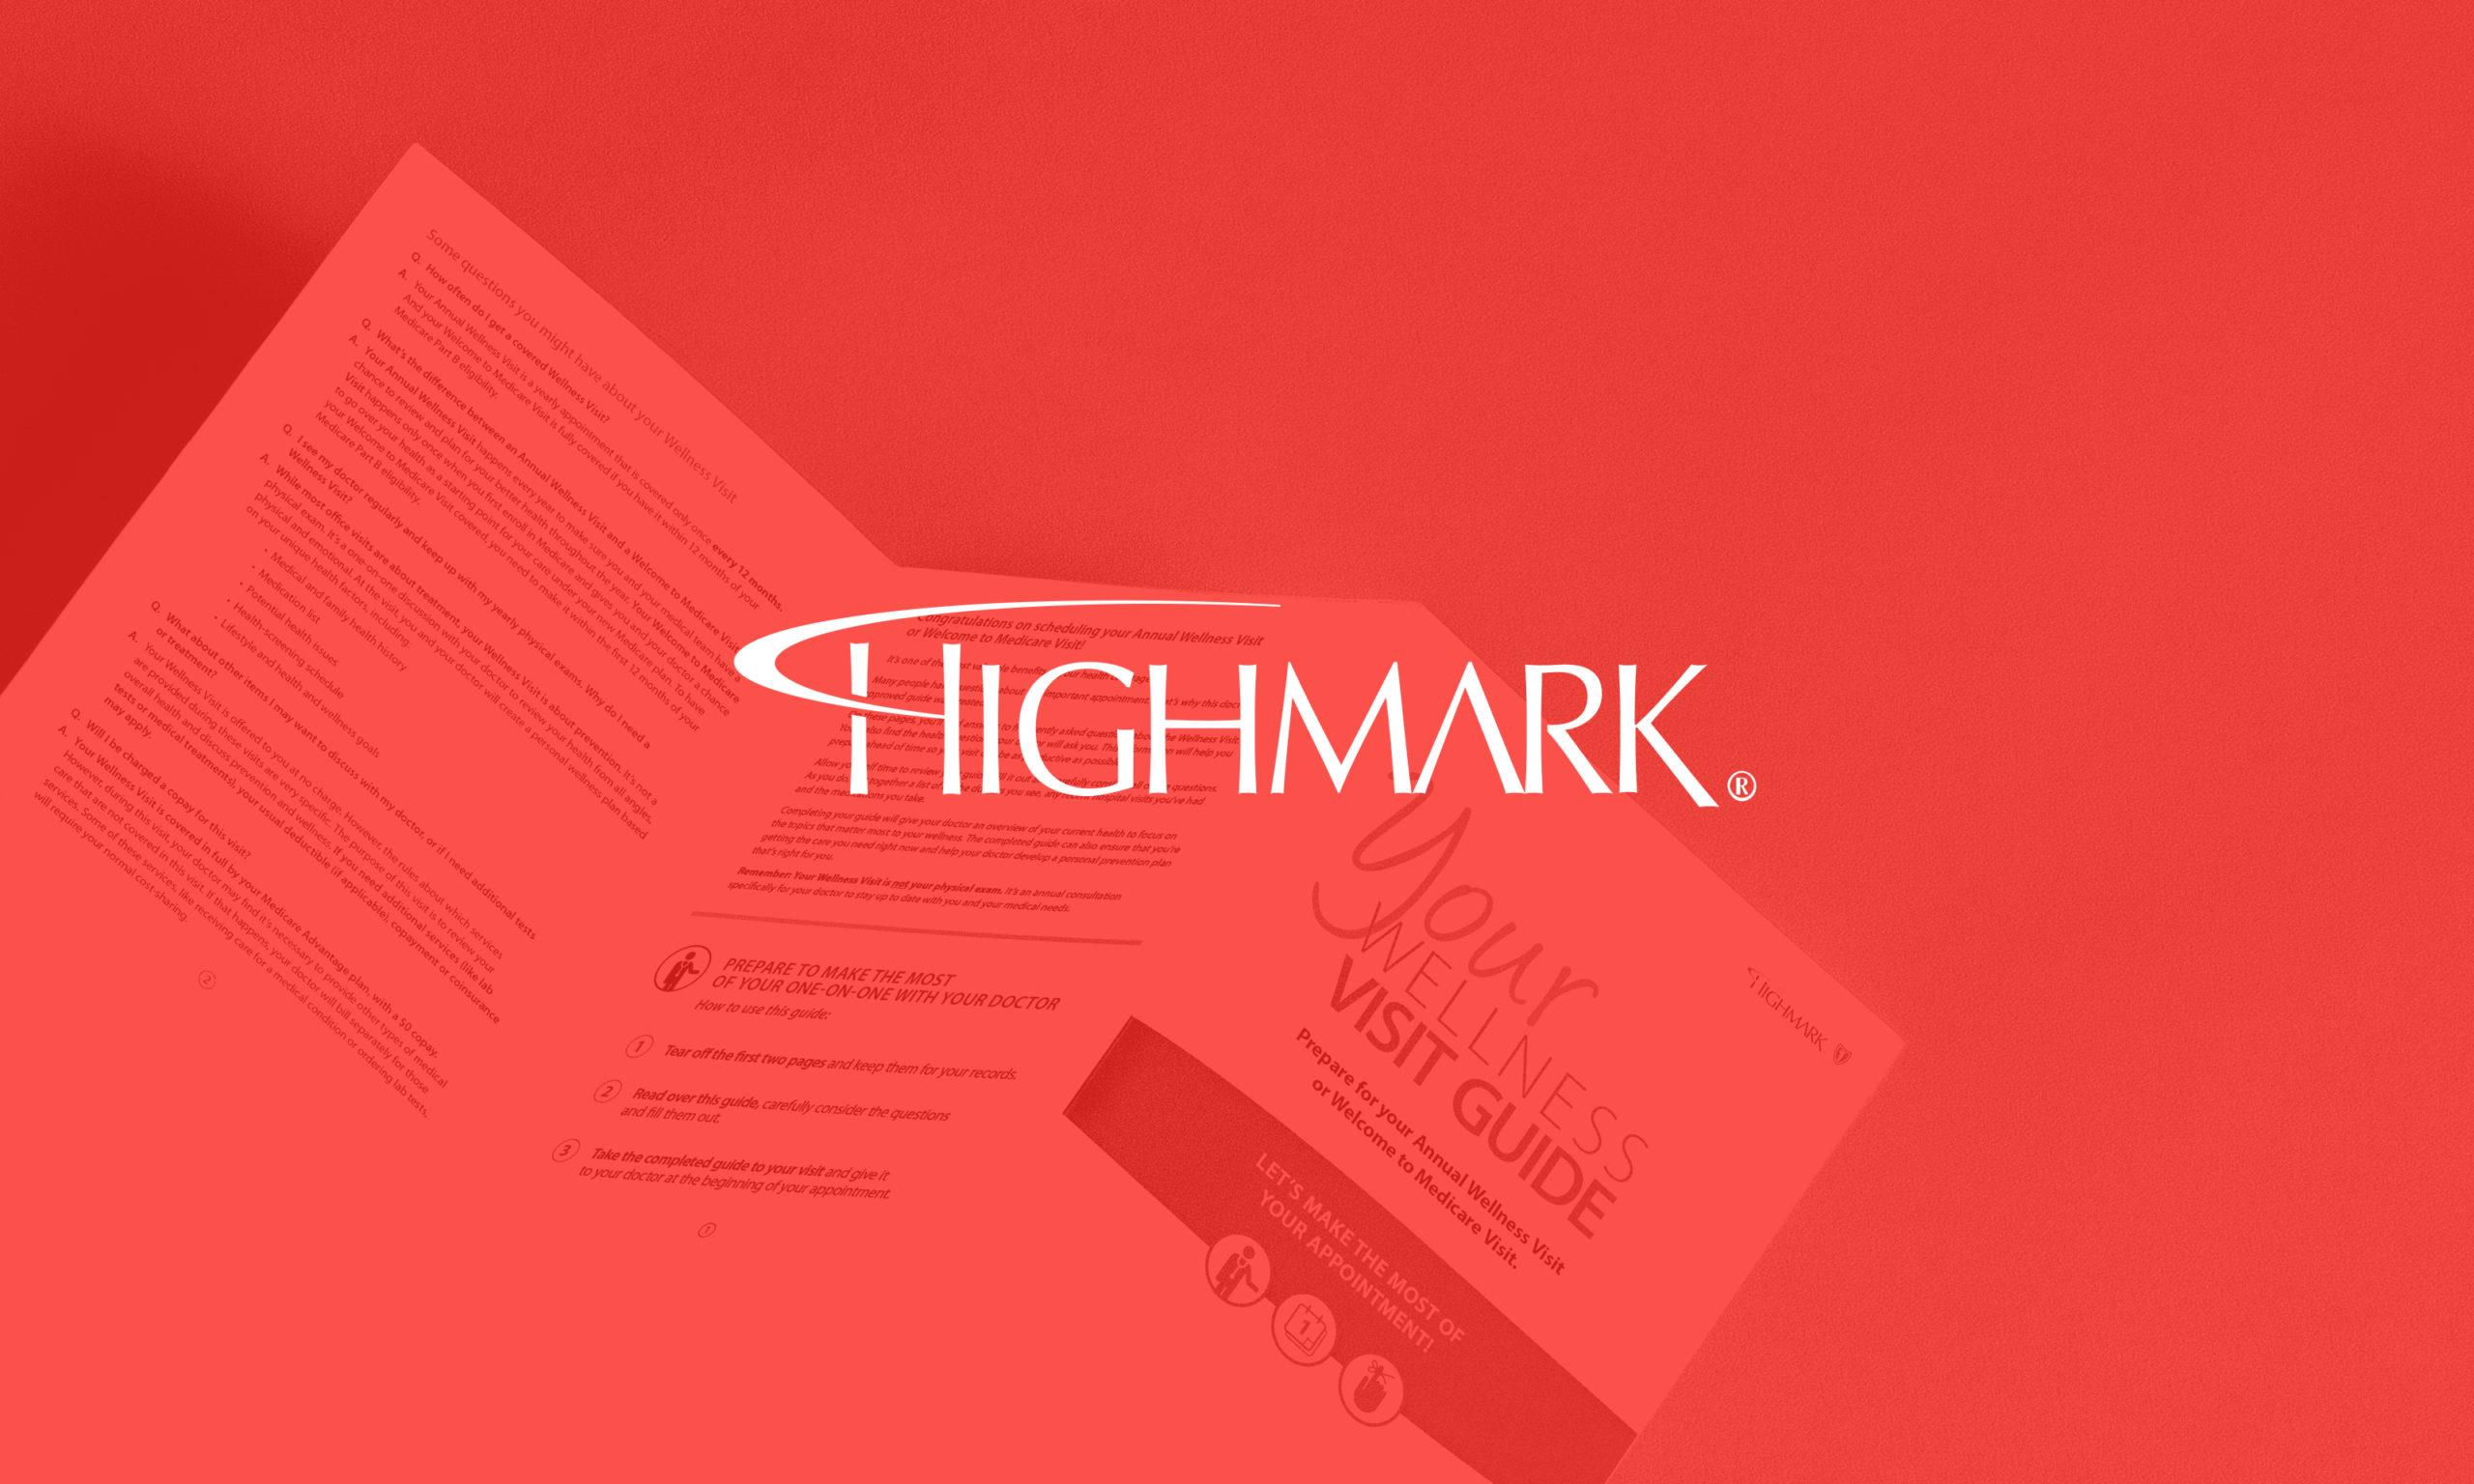 highmark_Red